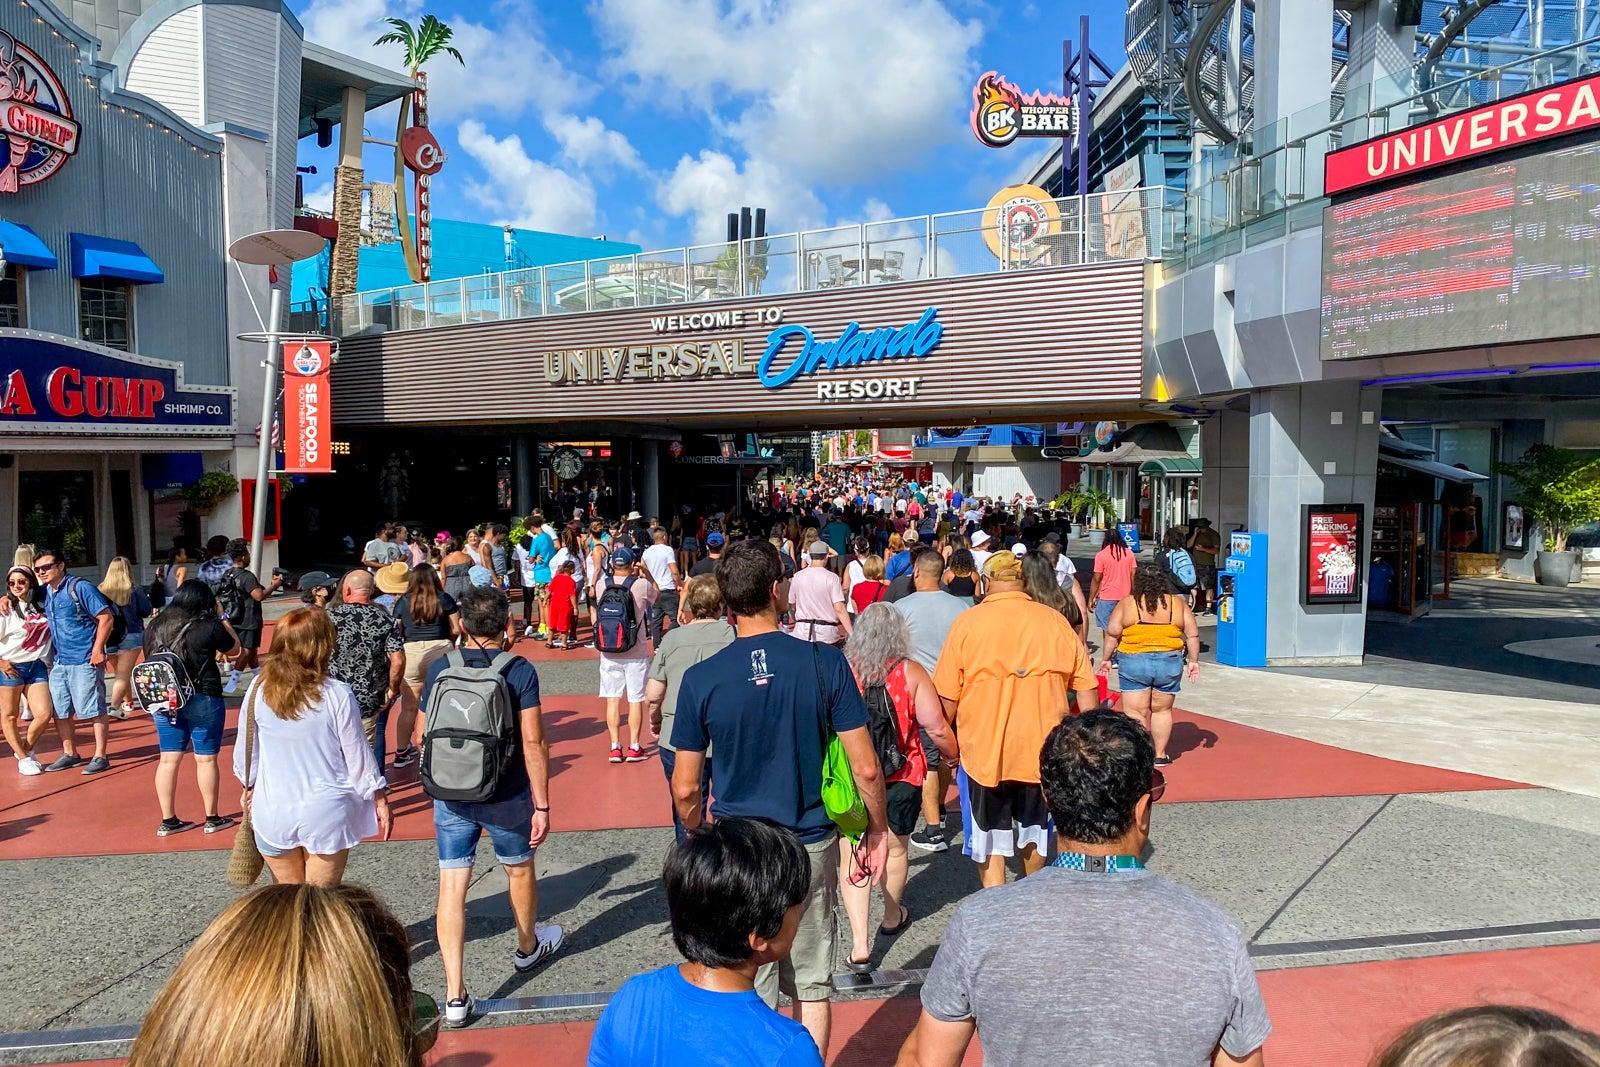 Despite new CDC guidance, masks remain optional at Universal Orlando